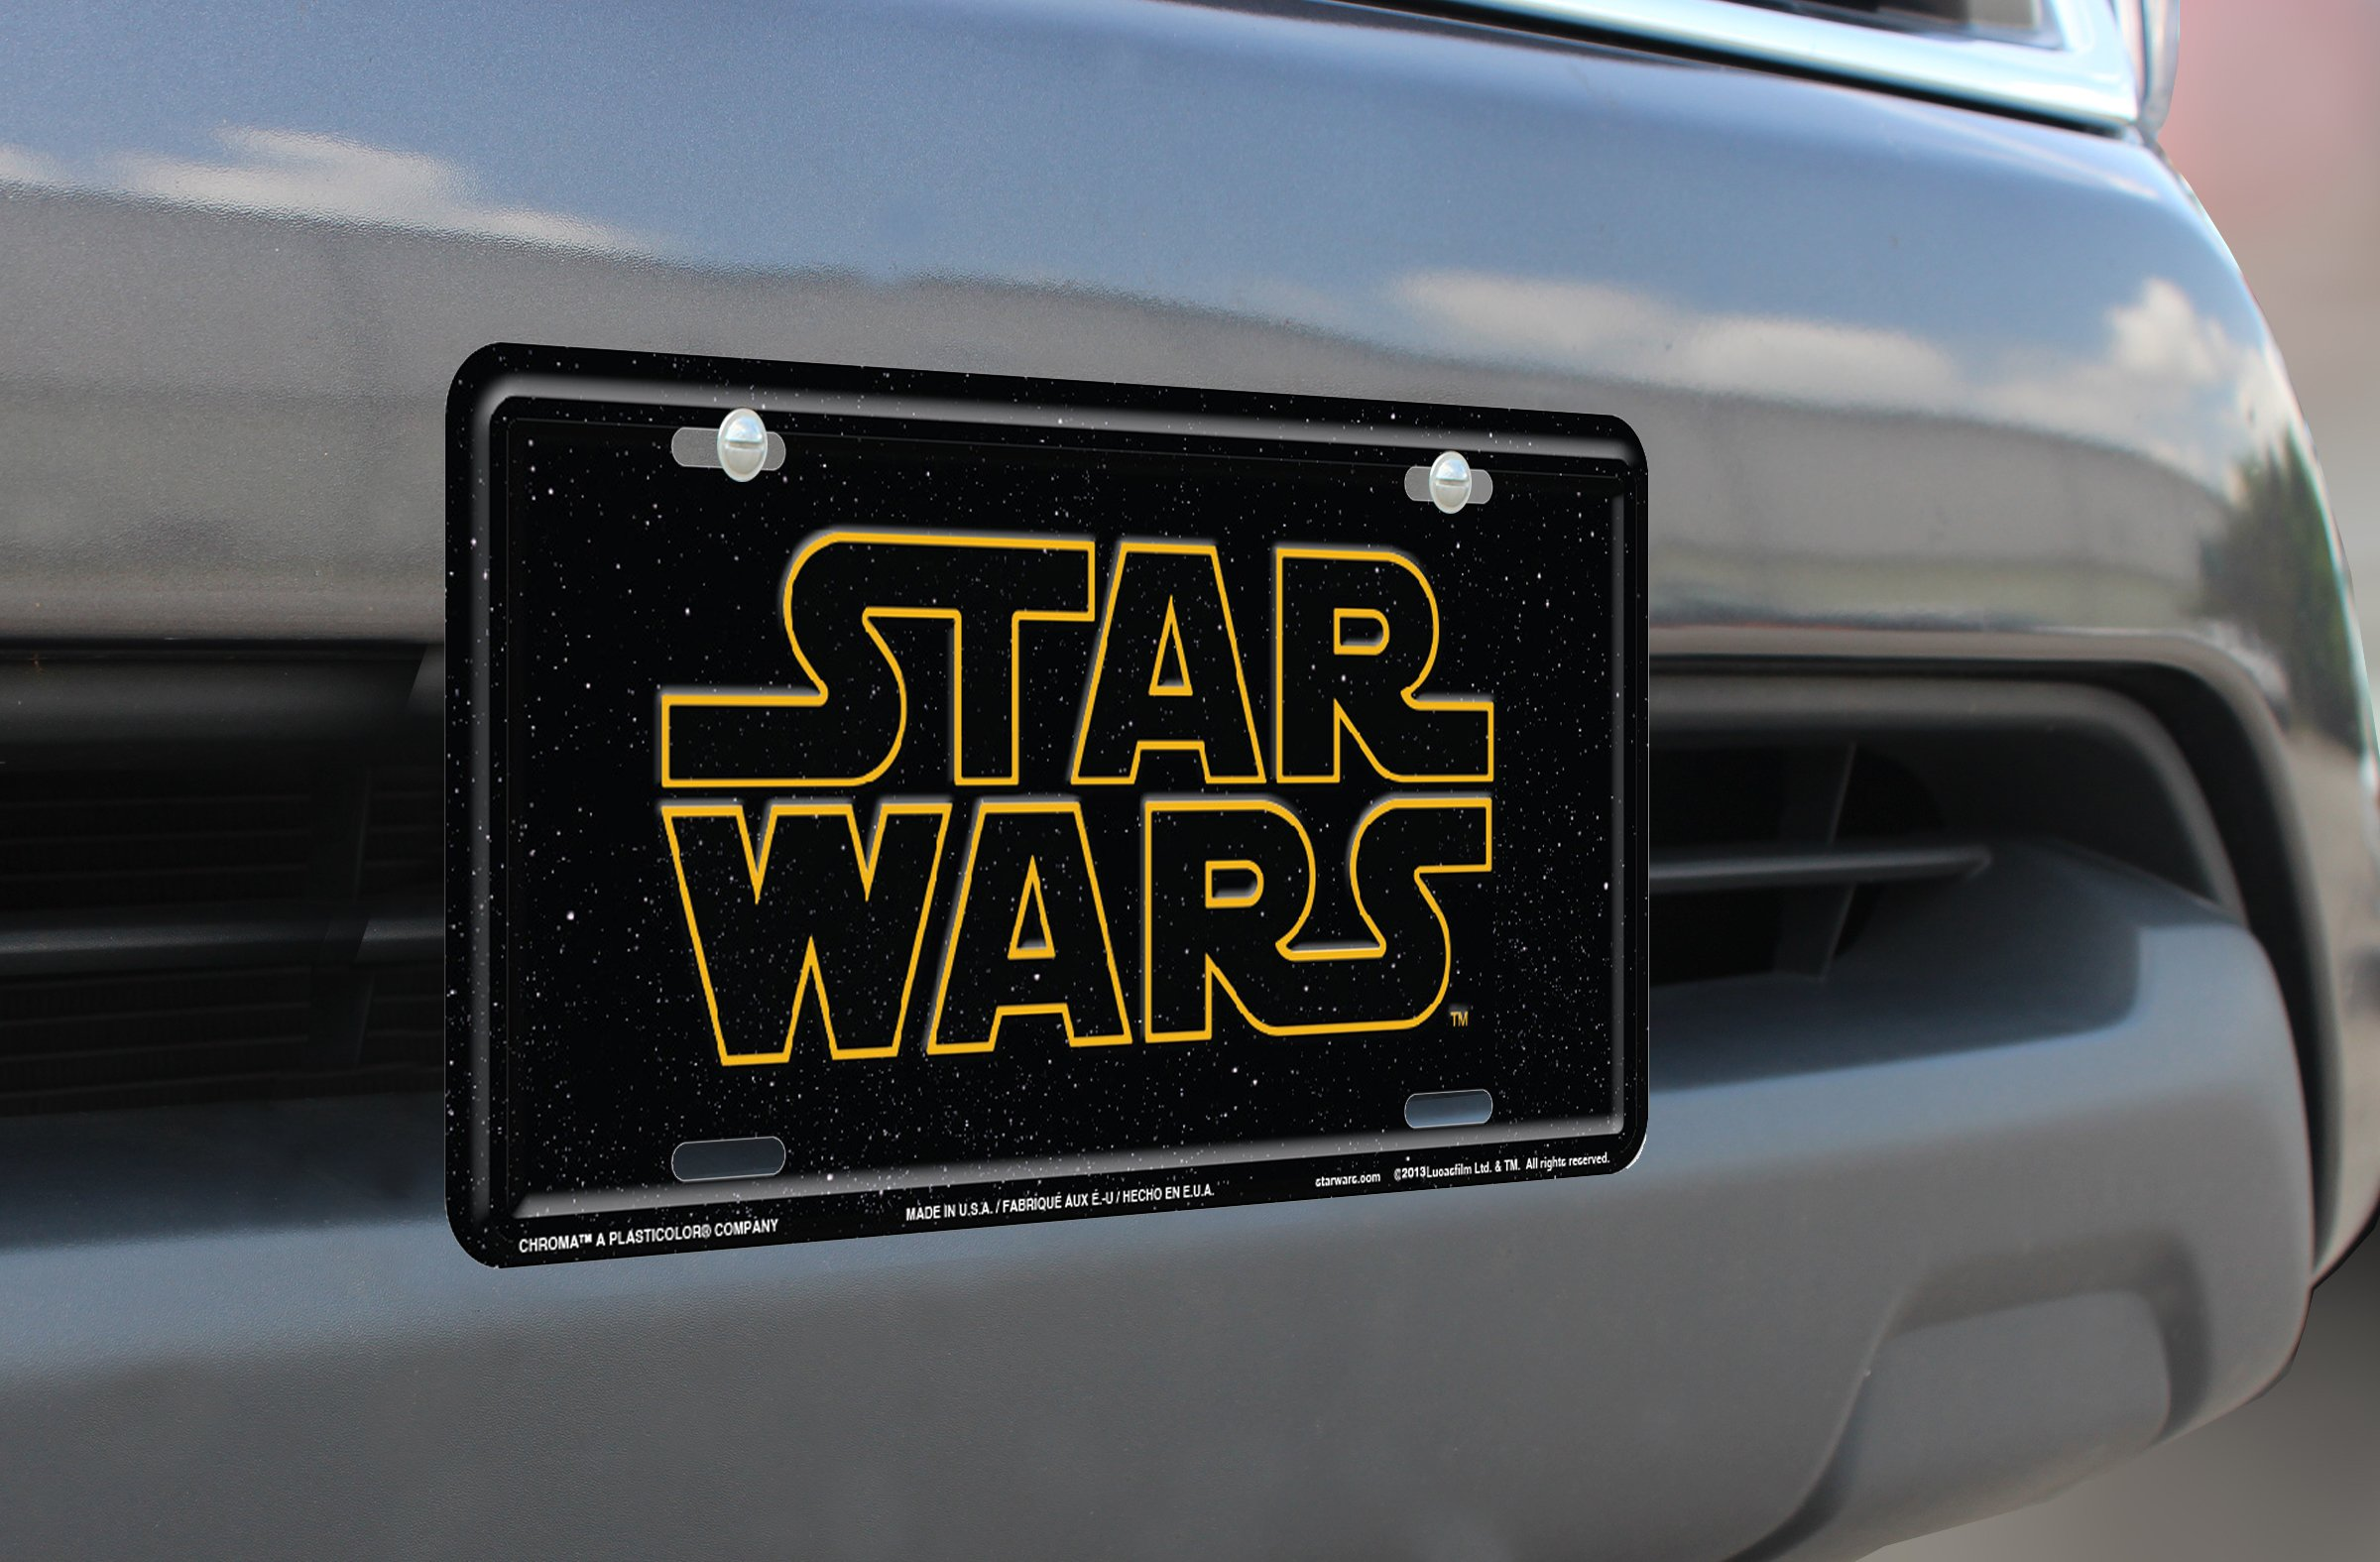 Long Live The Resistance Star Wars Chrome License Plate Frame License Plates Online